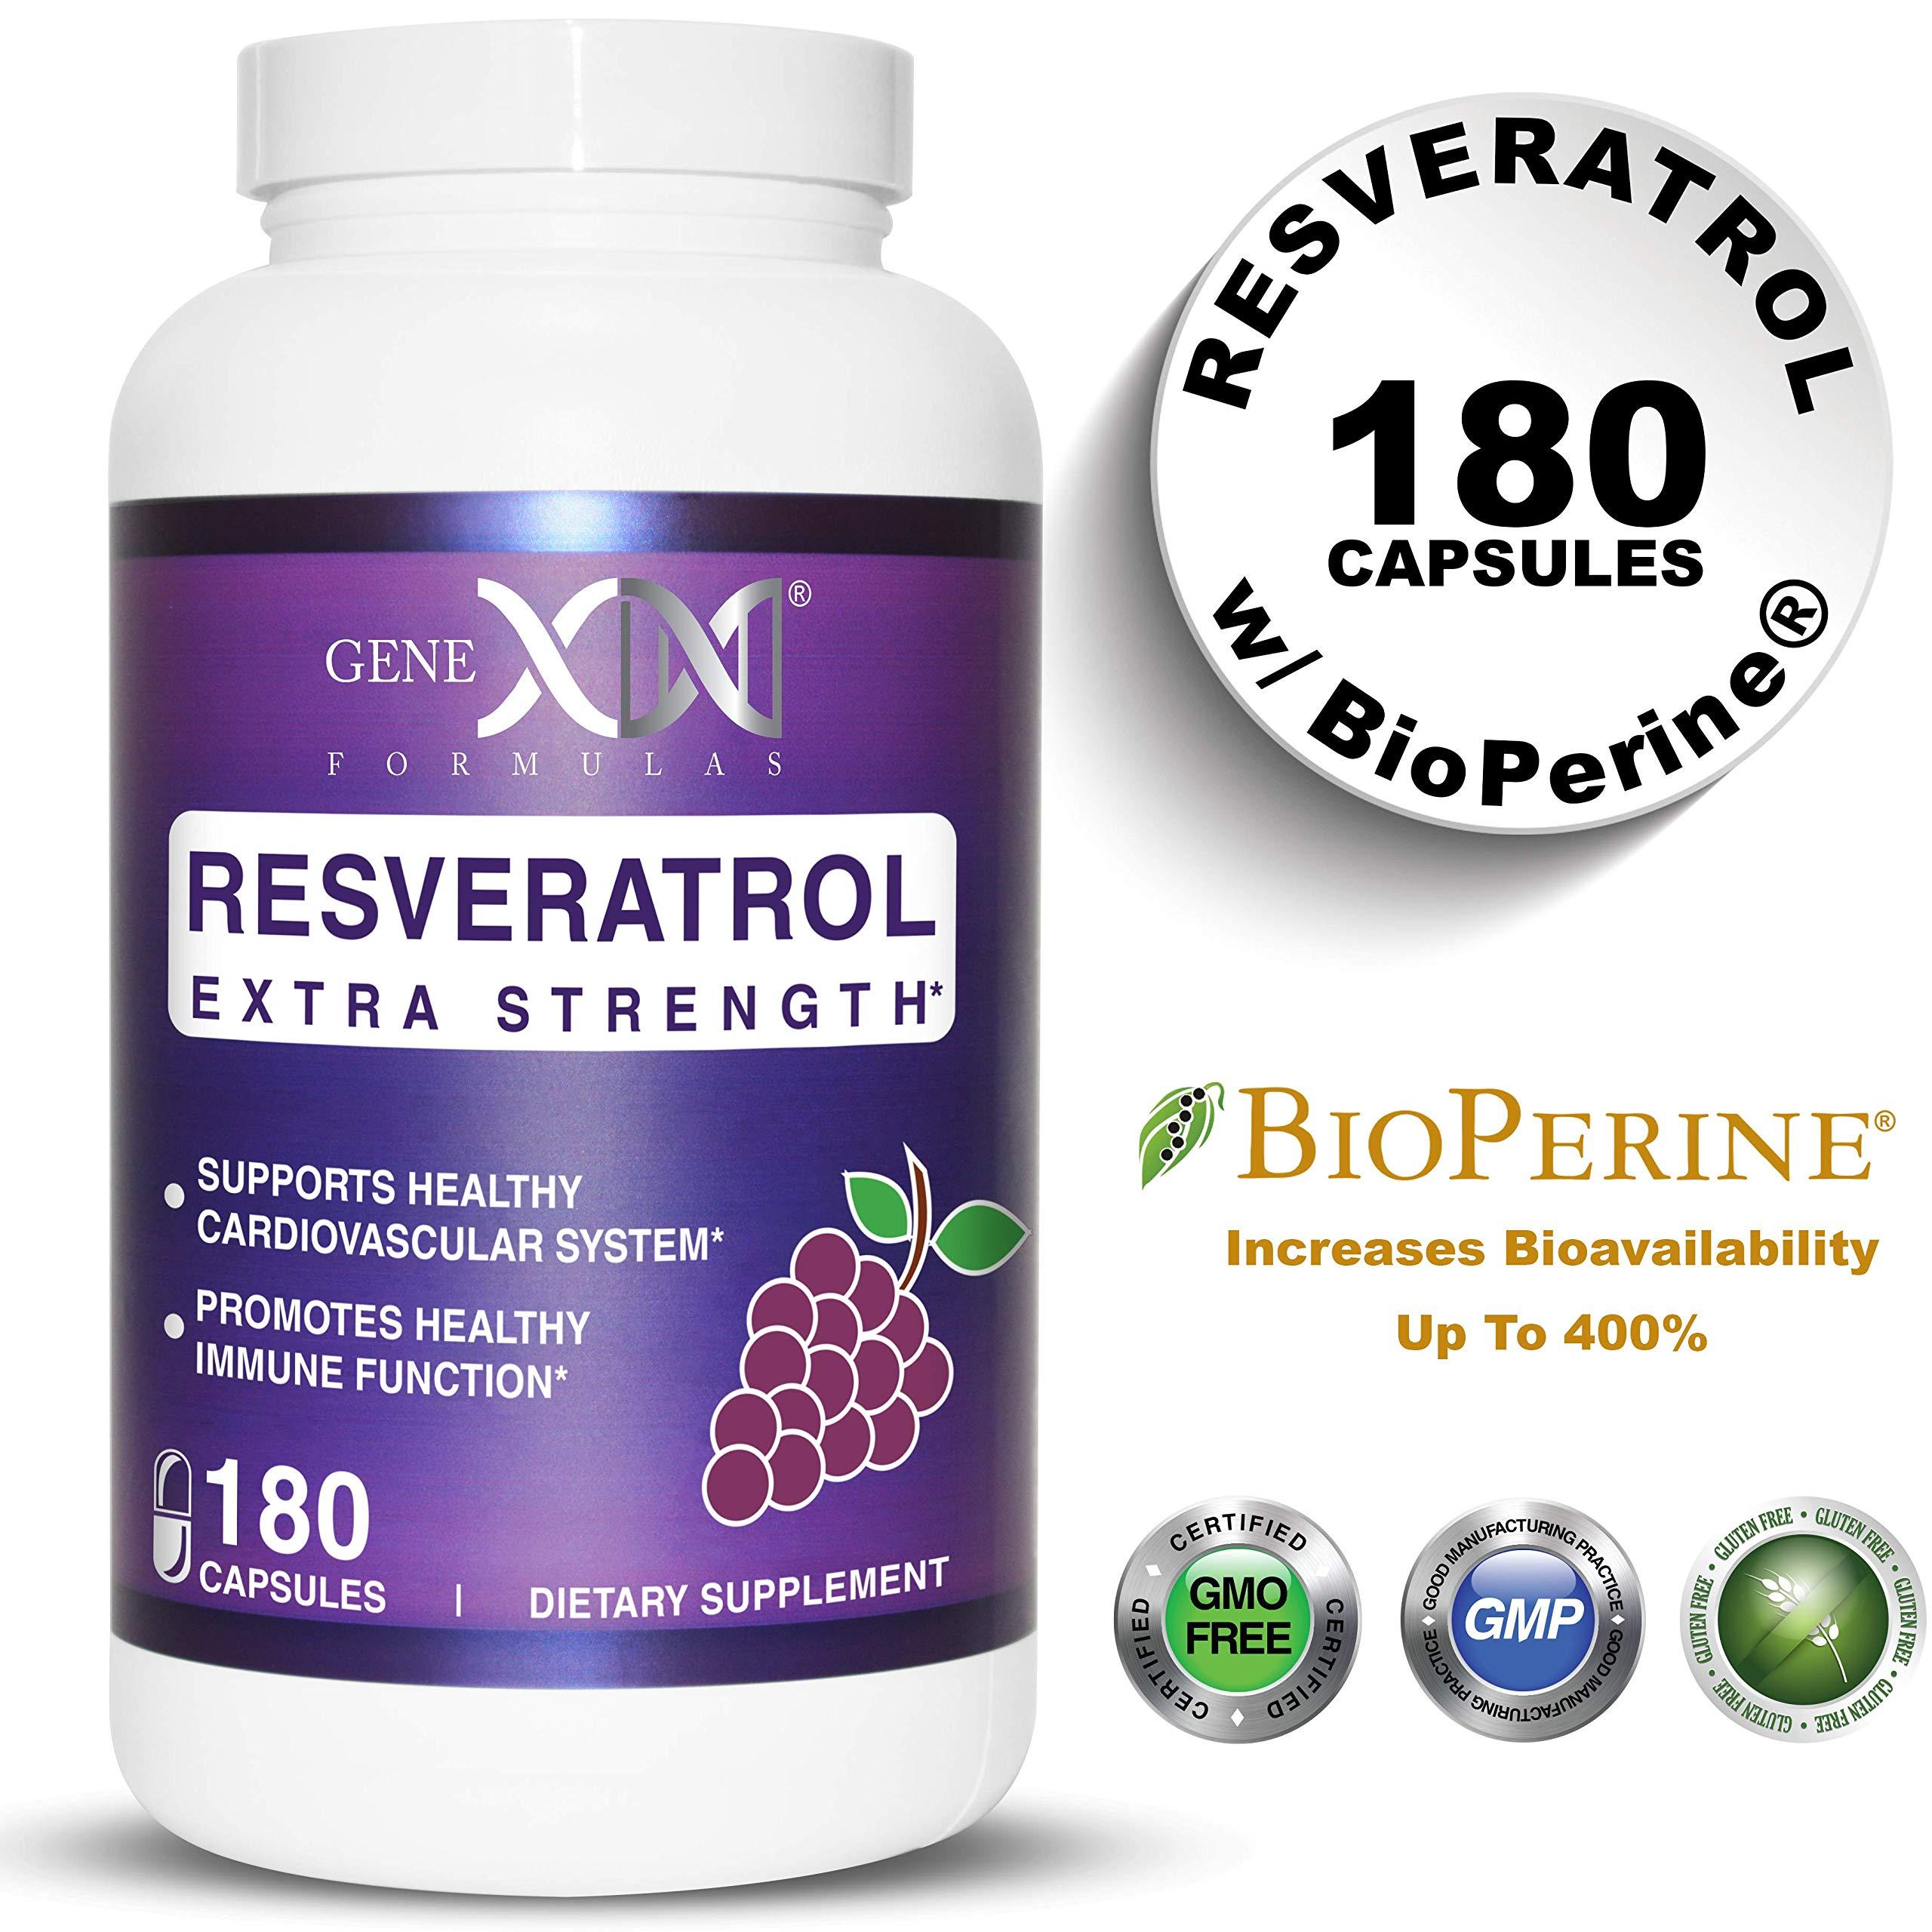 Genex Resveratrol 1000mg Per Serving - Value Size - Max Strength 180 Caps - Antioxidant Supplement Extract | Trans-Resveratrol for Heart Health and Trans Resveratrol for Providing Maximim Benefits by Genex Formulas